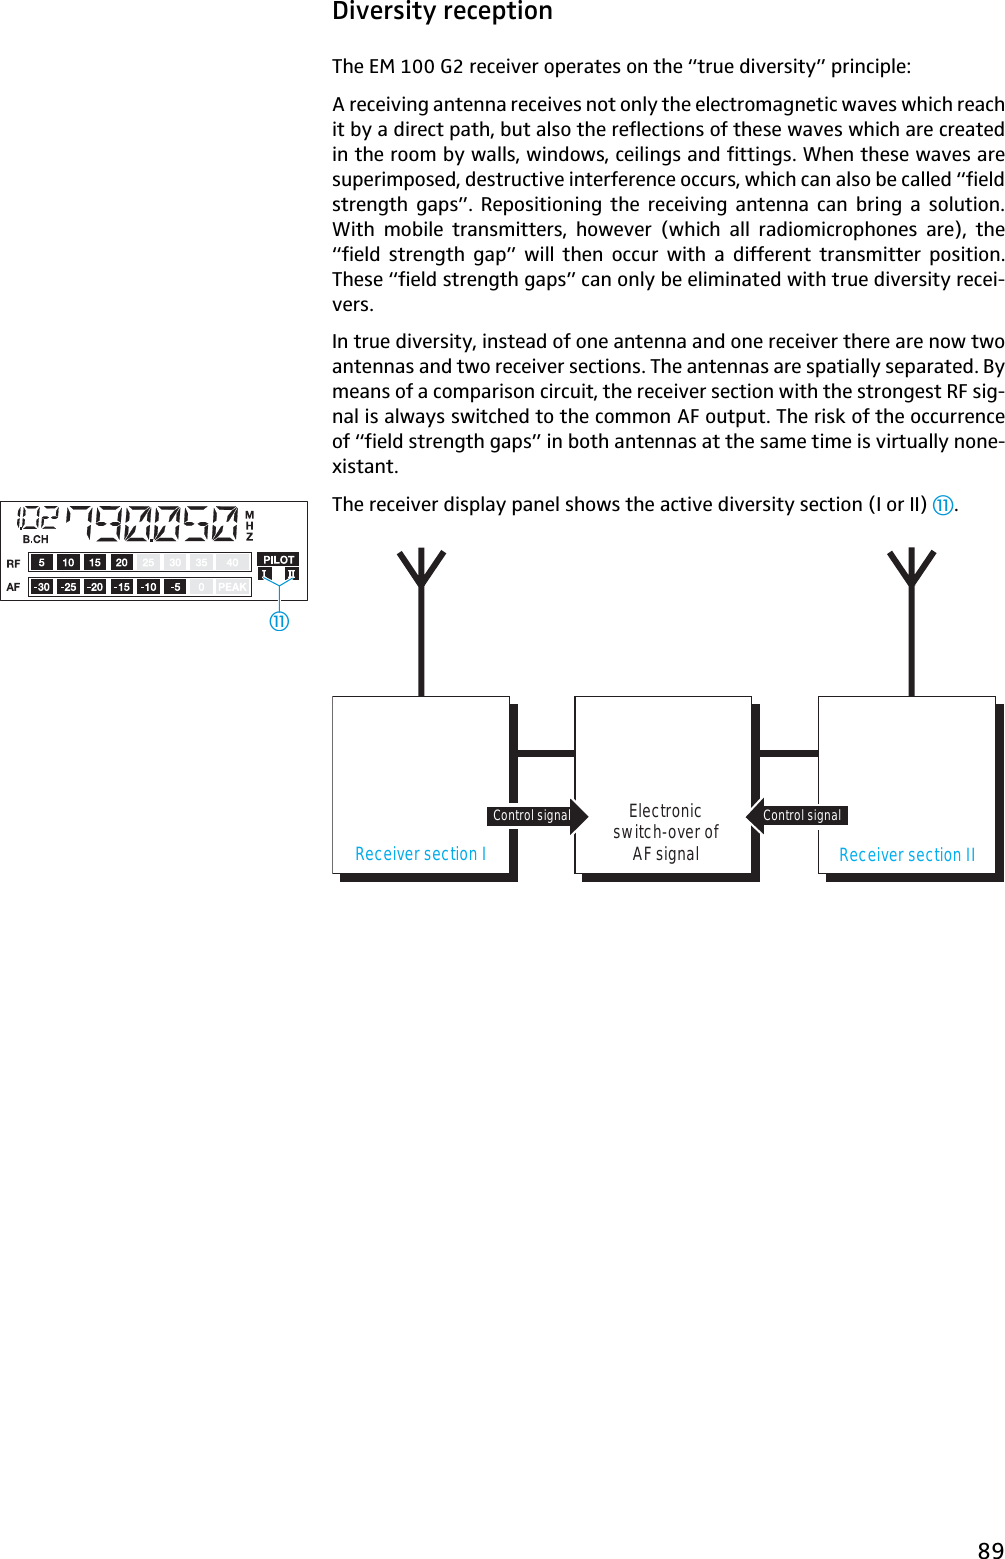 Sennheiser Ew 100 G2 Image 550712 Manual Guide